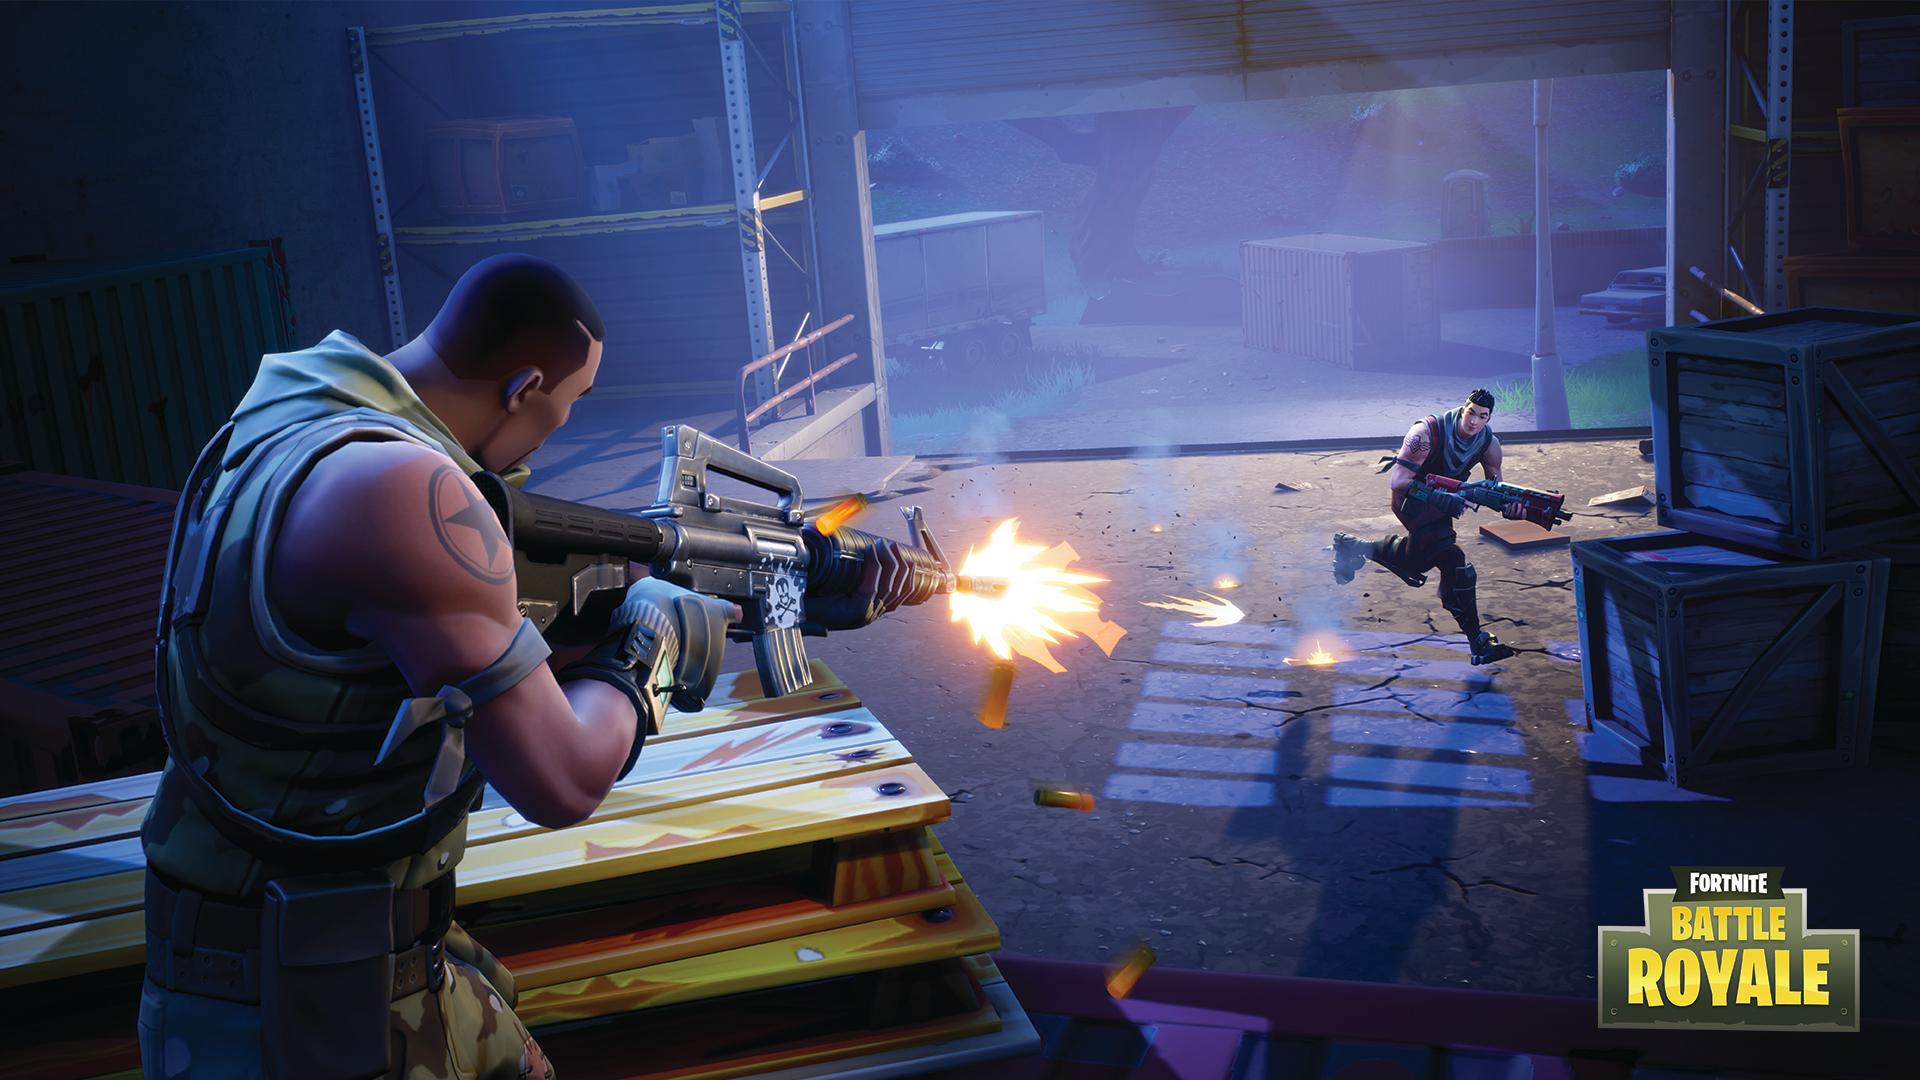 Fornite Battle Royale Captura de tela